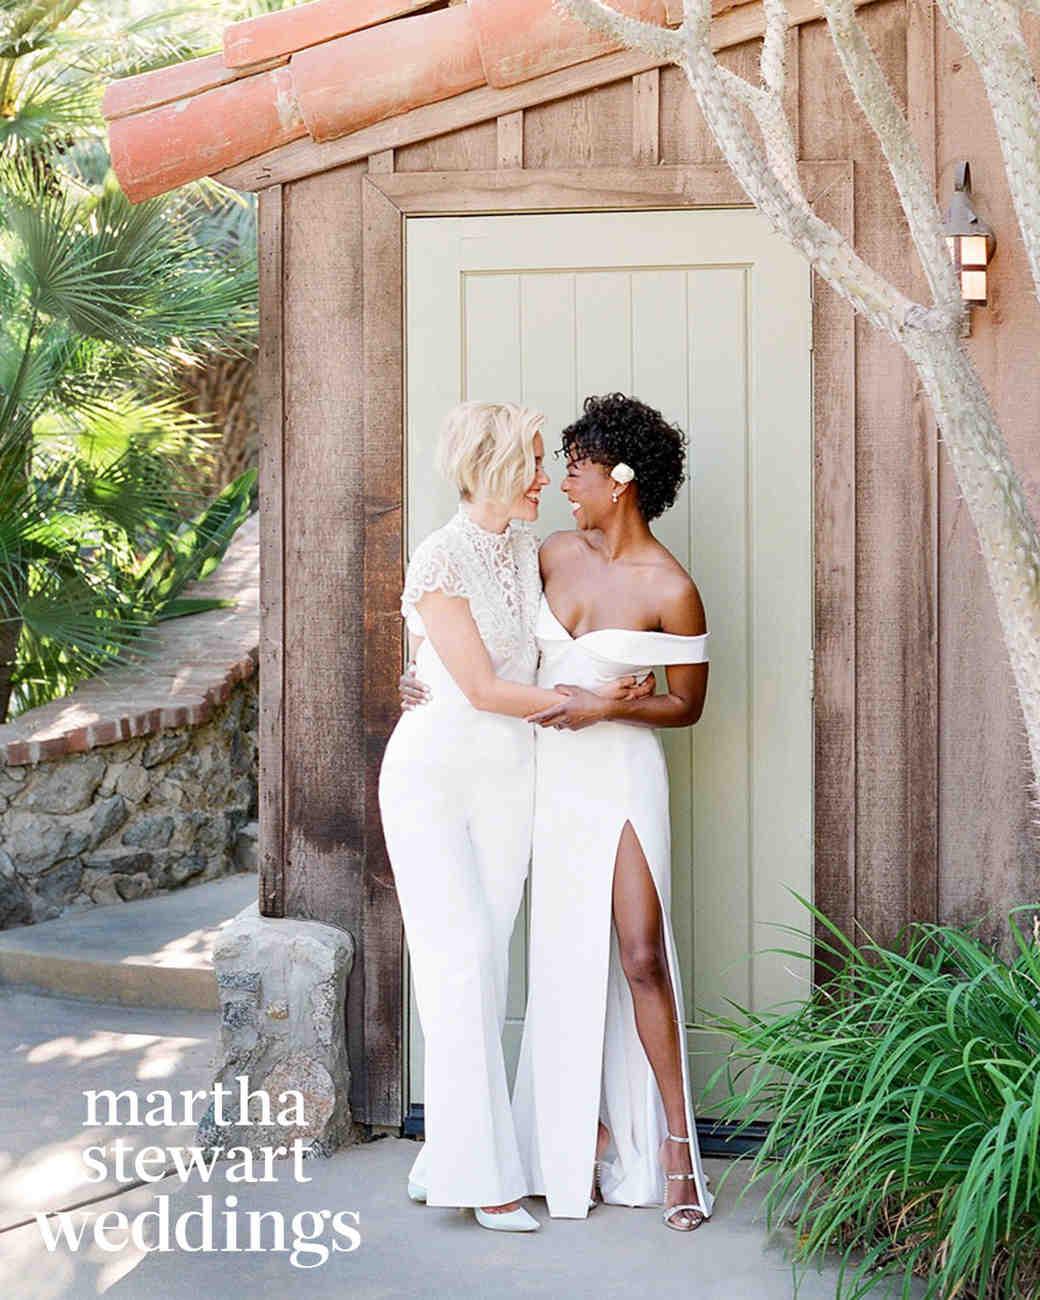 Exclusive See Samira Wiley And Lauren Morelli S Incredible Wedding Photos Martha Stewart Weddings